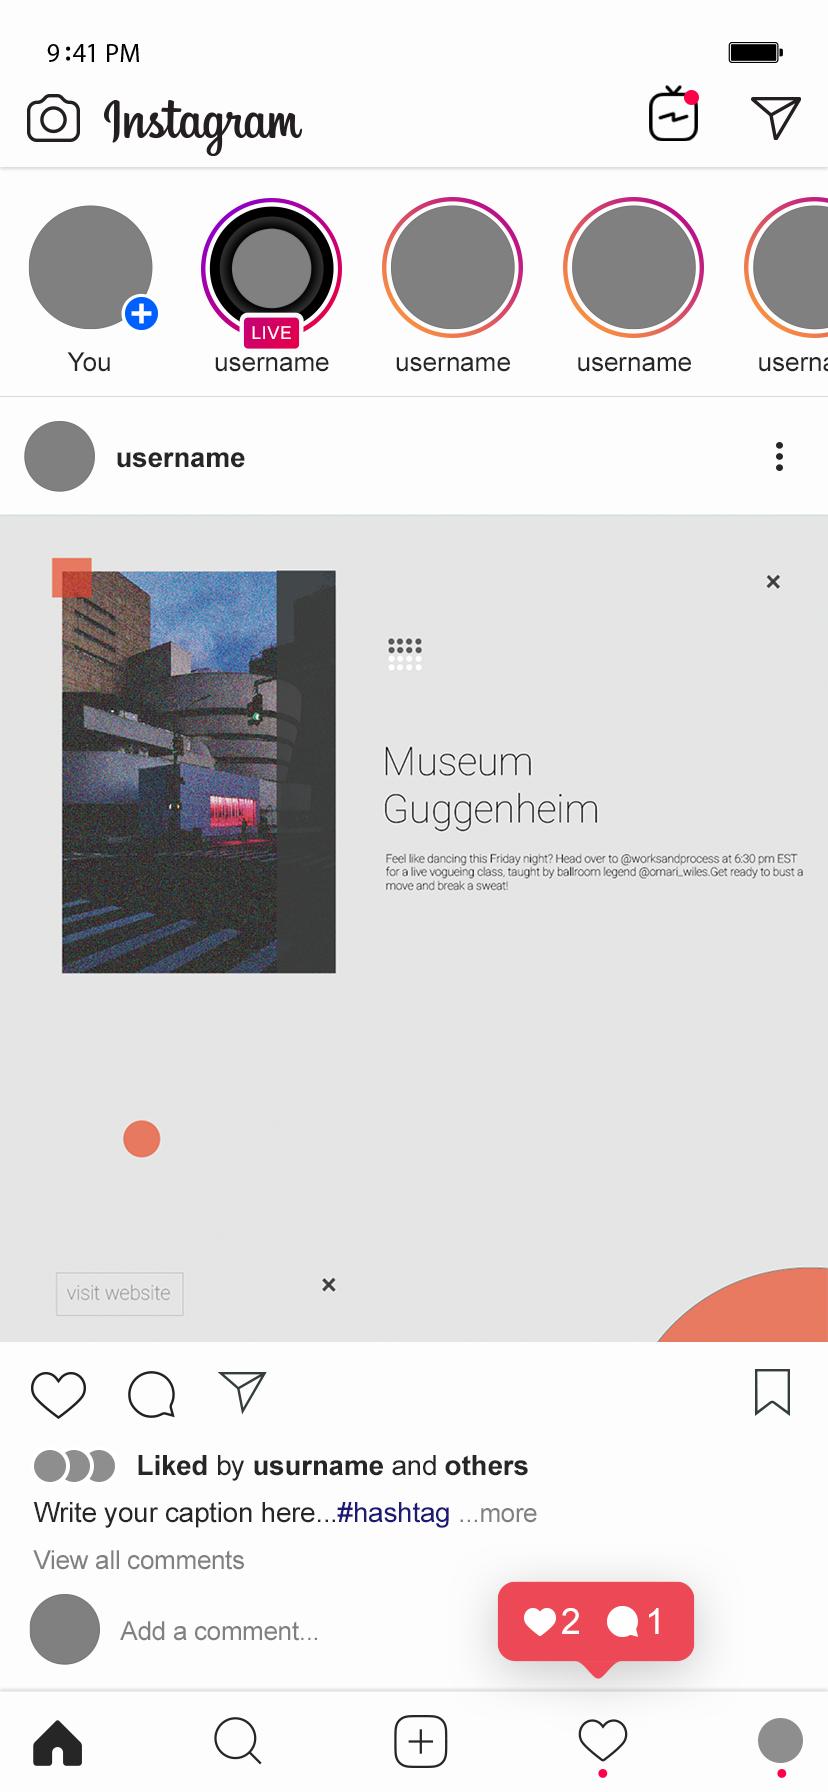 Guggenheim Museum Instagram Posts Design On Behance Instagram Posts Post Design Guggenheim